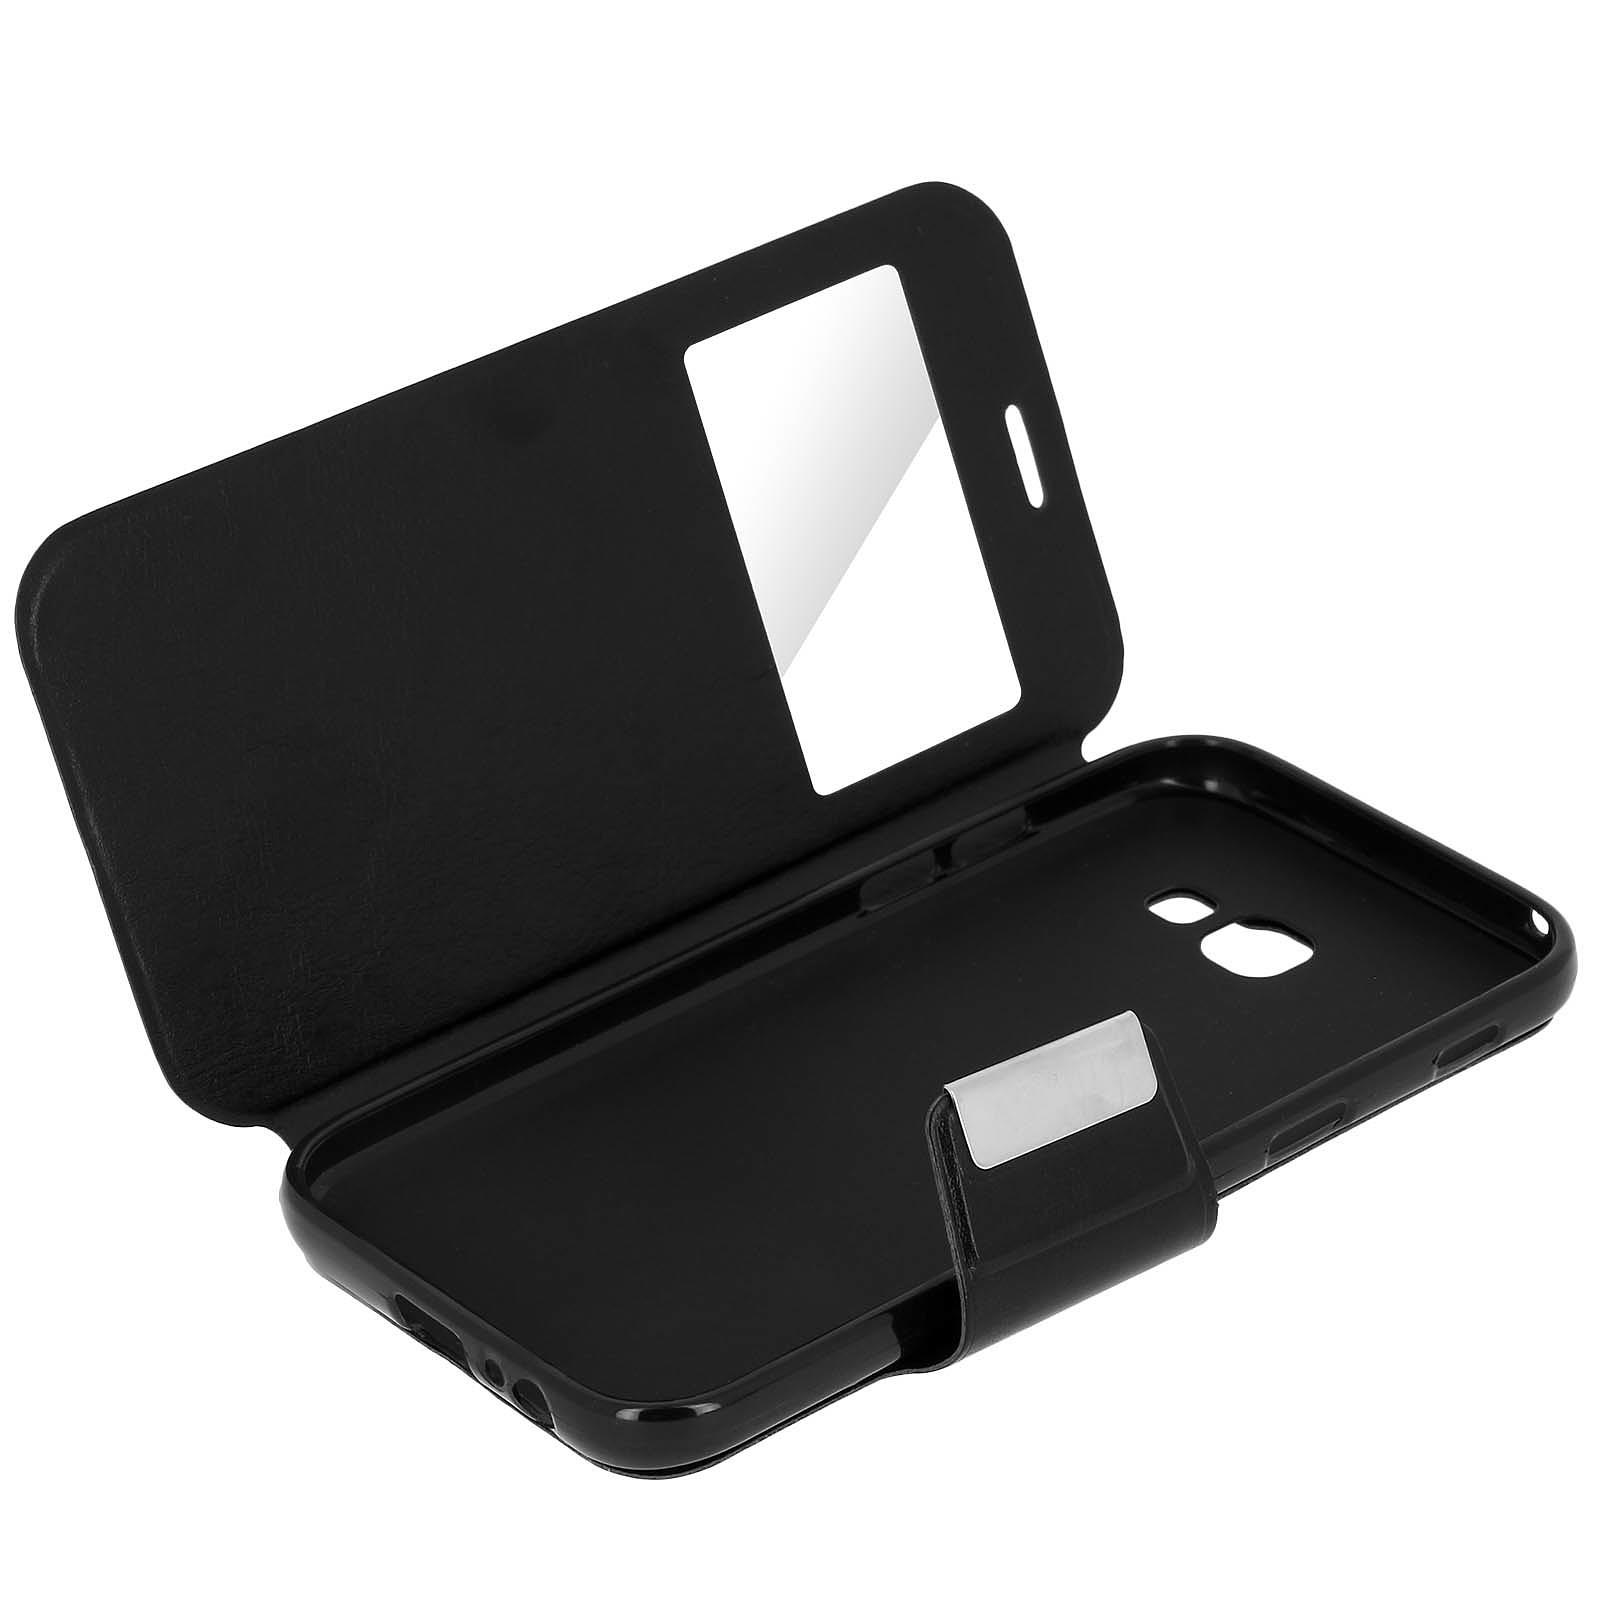 Avizar Etui folio Noir pour Samsung Galaxy A3 2017